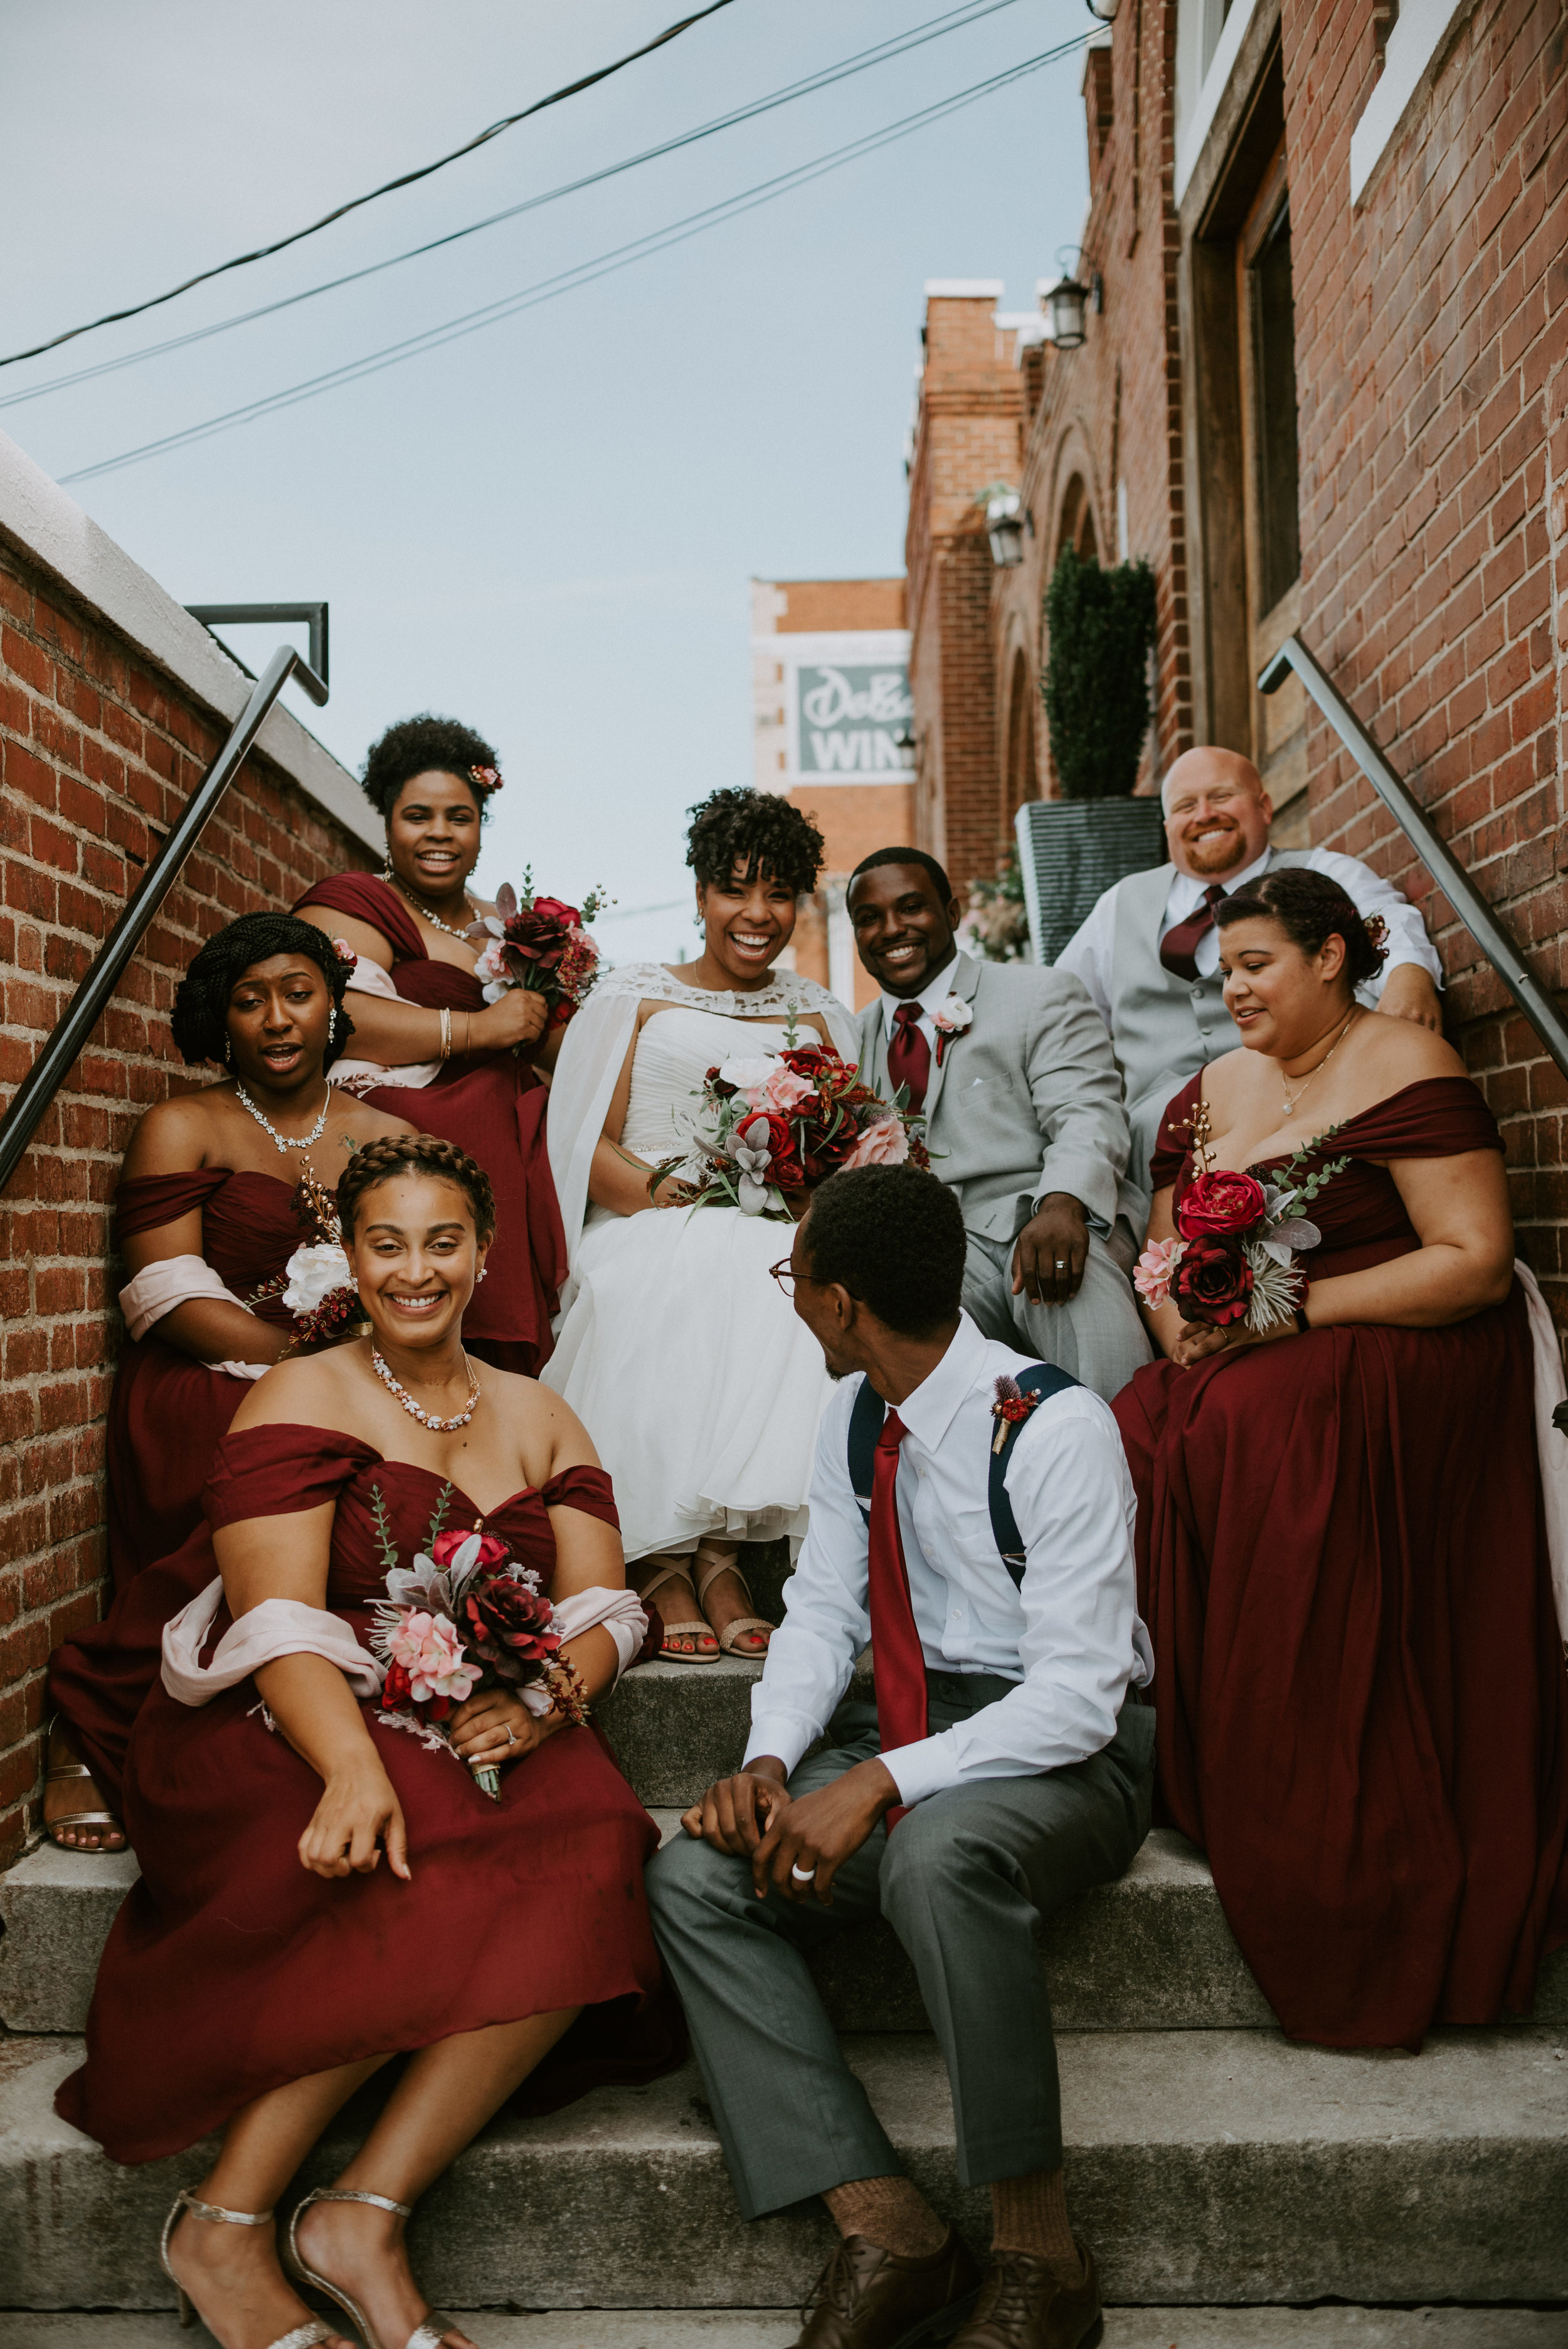 WonderlyCreative_Wedding_6.7.18_Khara&Dwayne_-670.jpg